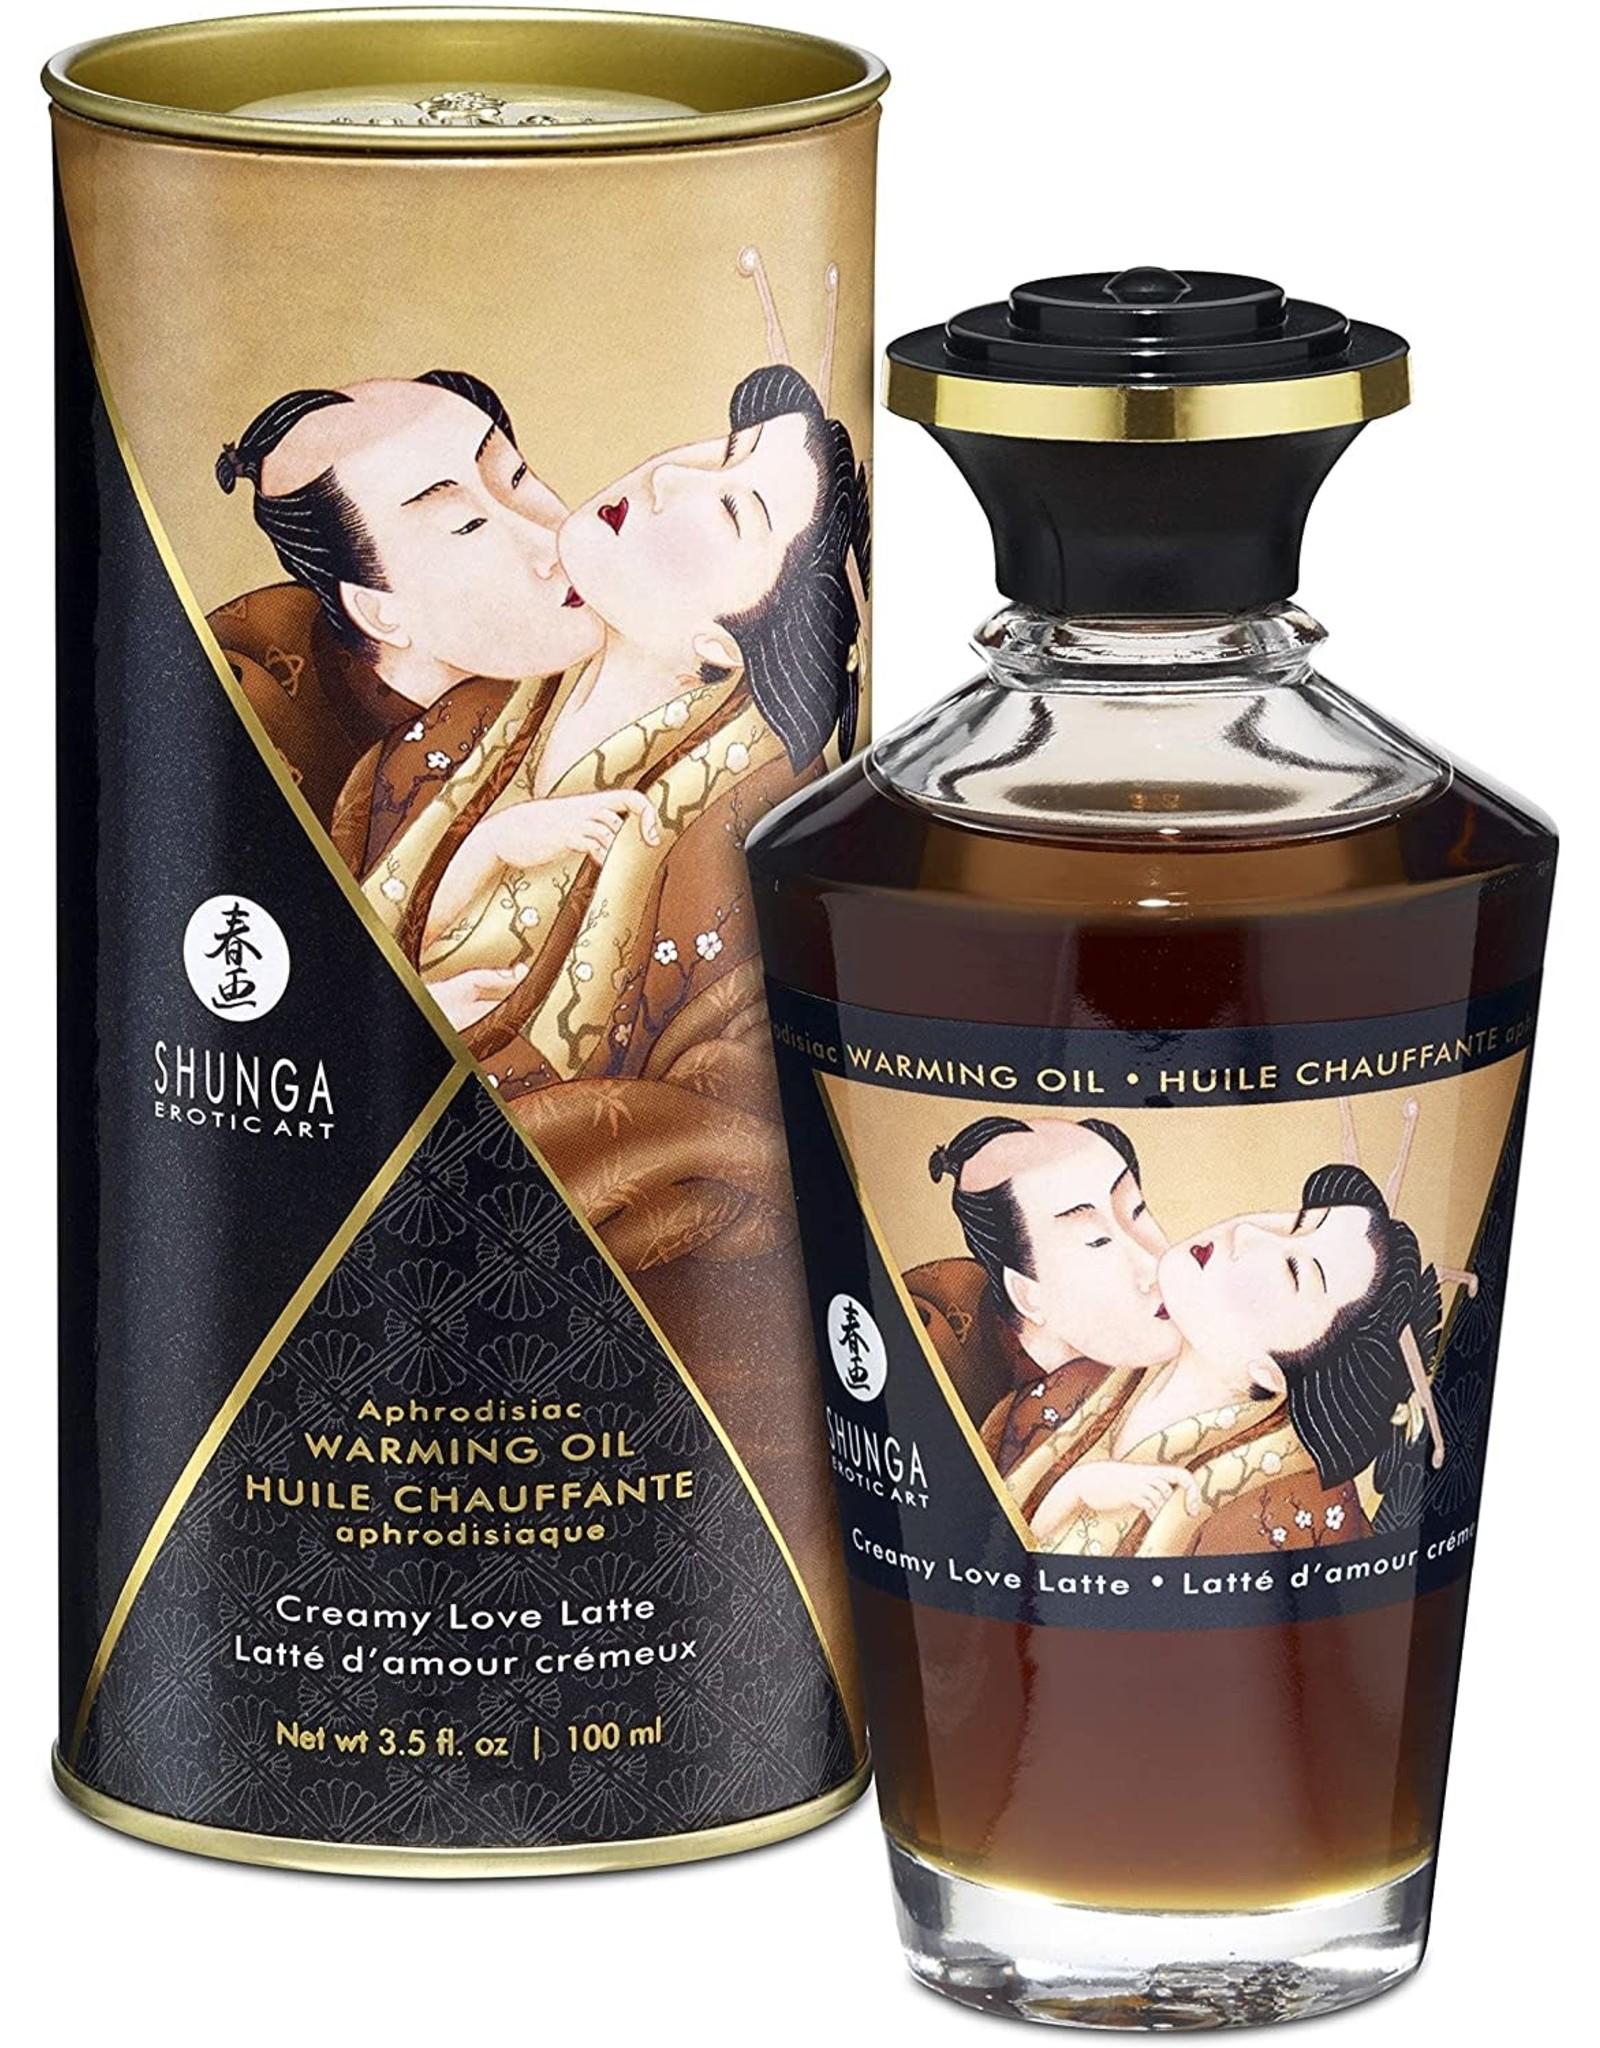 SHUNGA - APHRODISIAC OILS - CREAMY LOVE LATTE 3.5oz